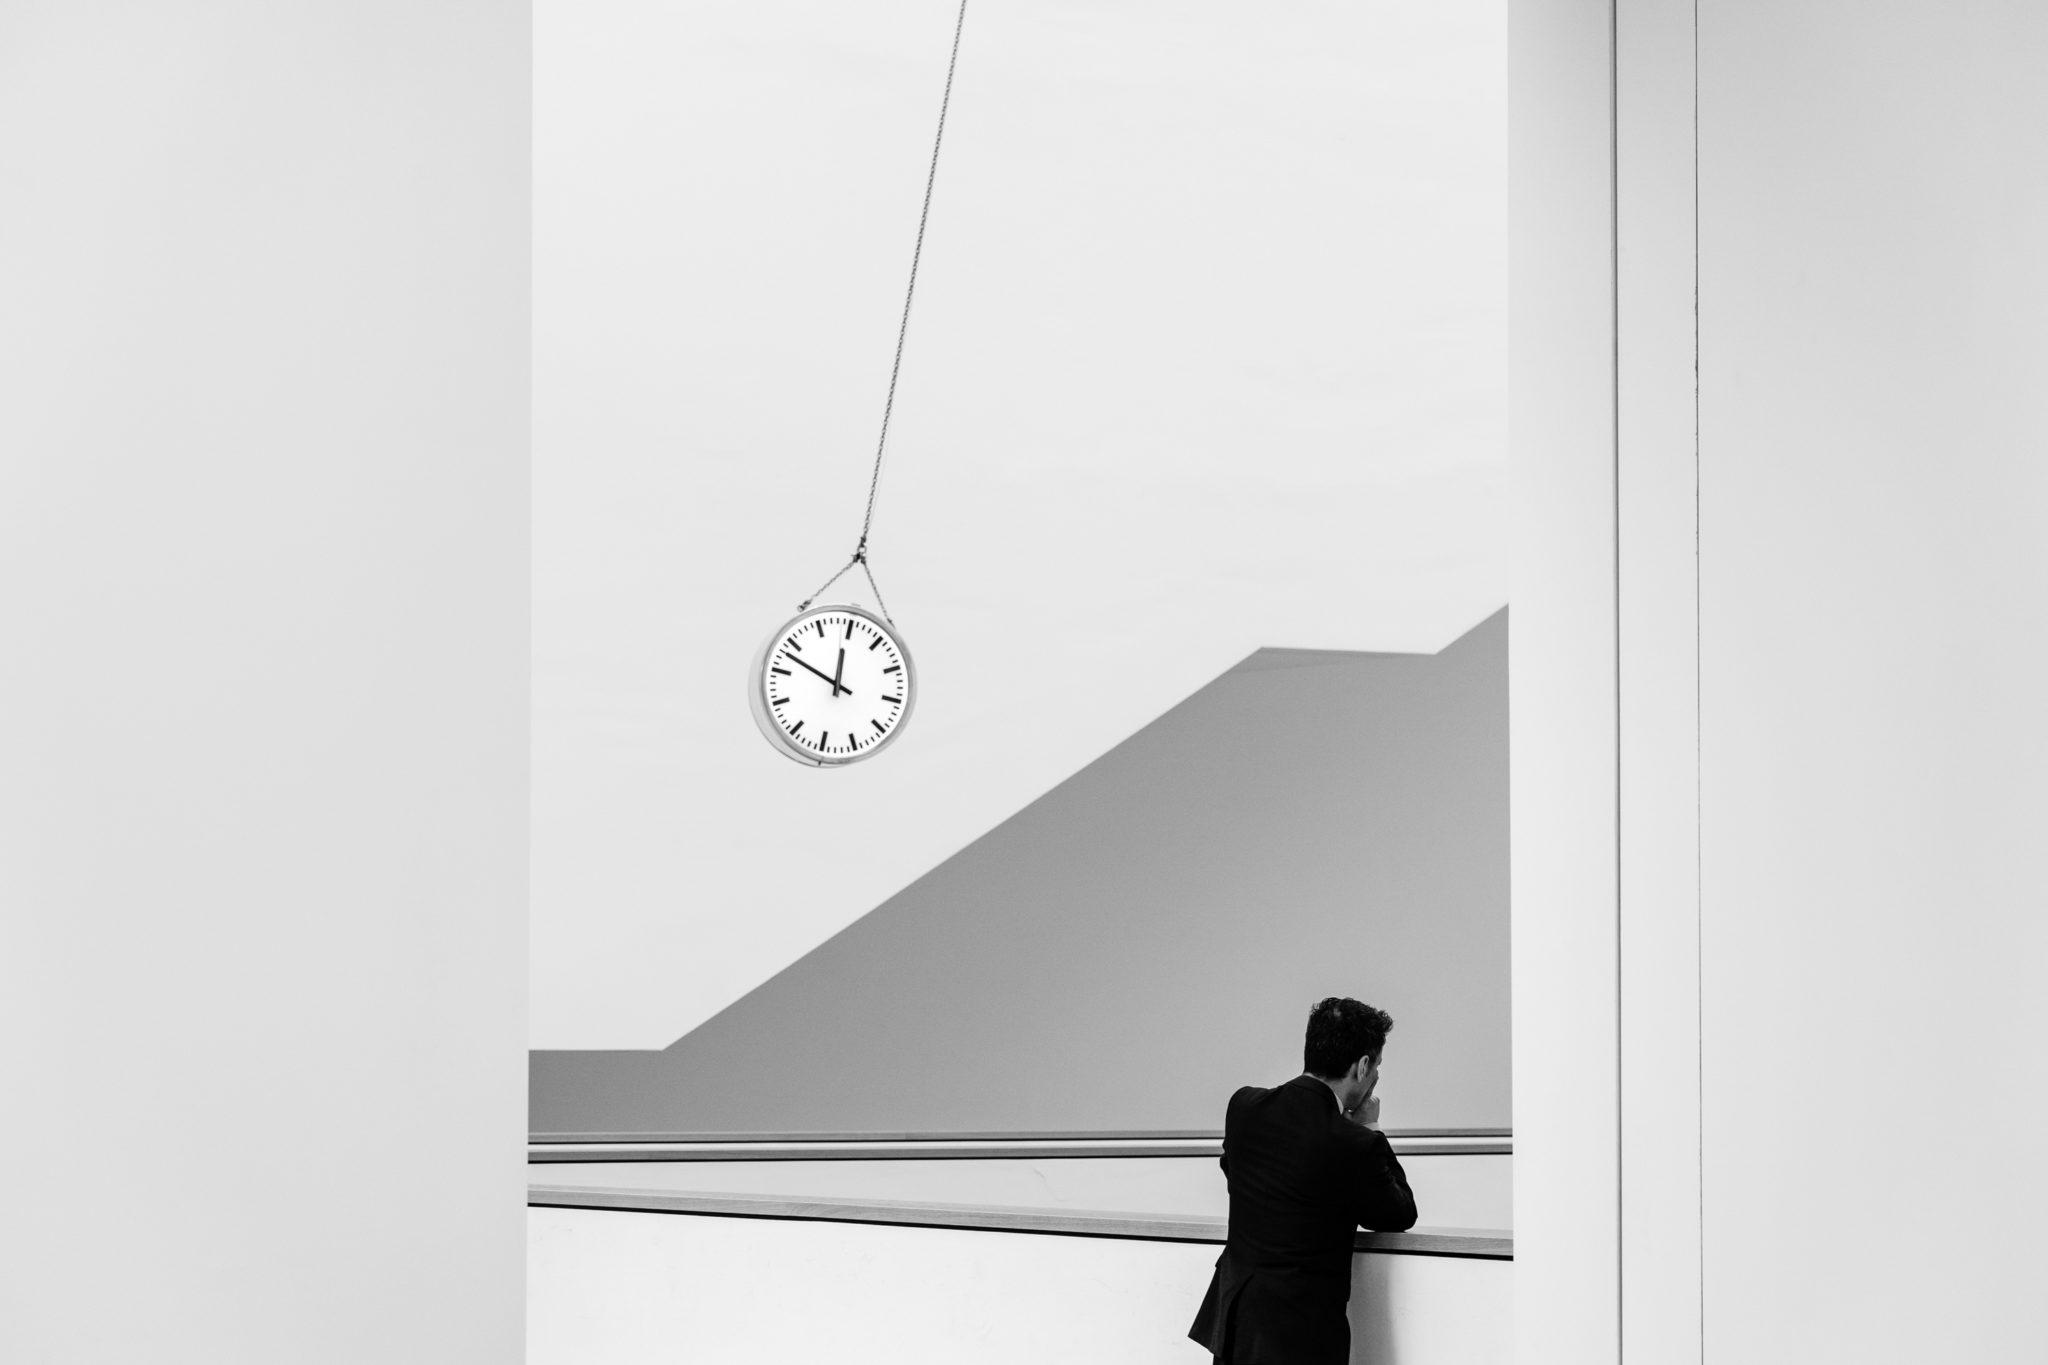 querformat-fotografie - Achim Katzberg - querformat-fotografie_MKG_VErnissage-010